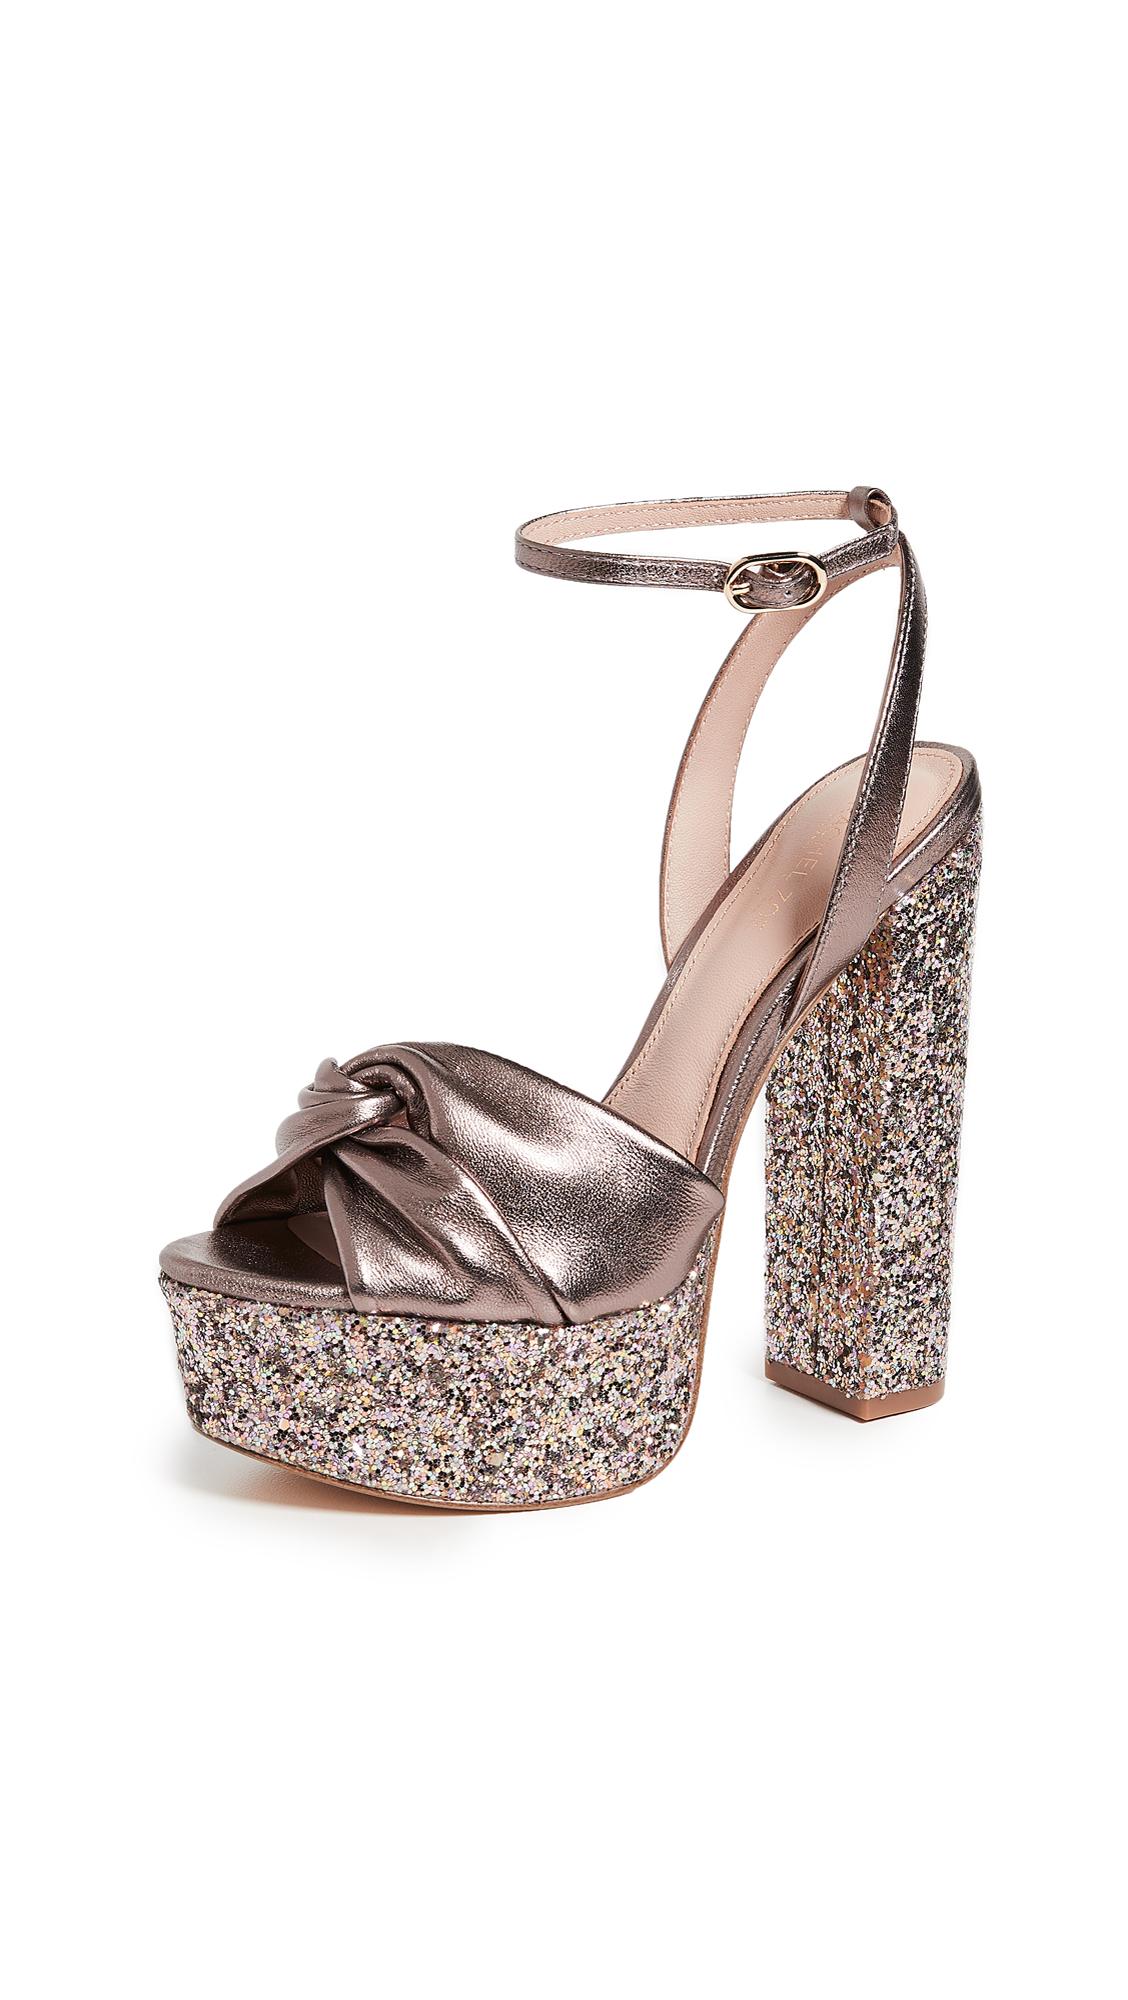 Rachel Zoe Claudette Glitter Platform Sandals - Blush Multi